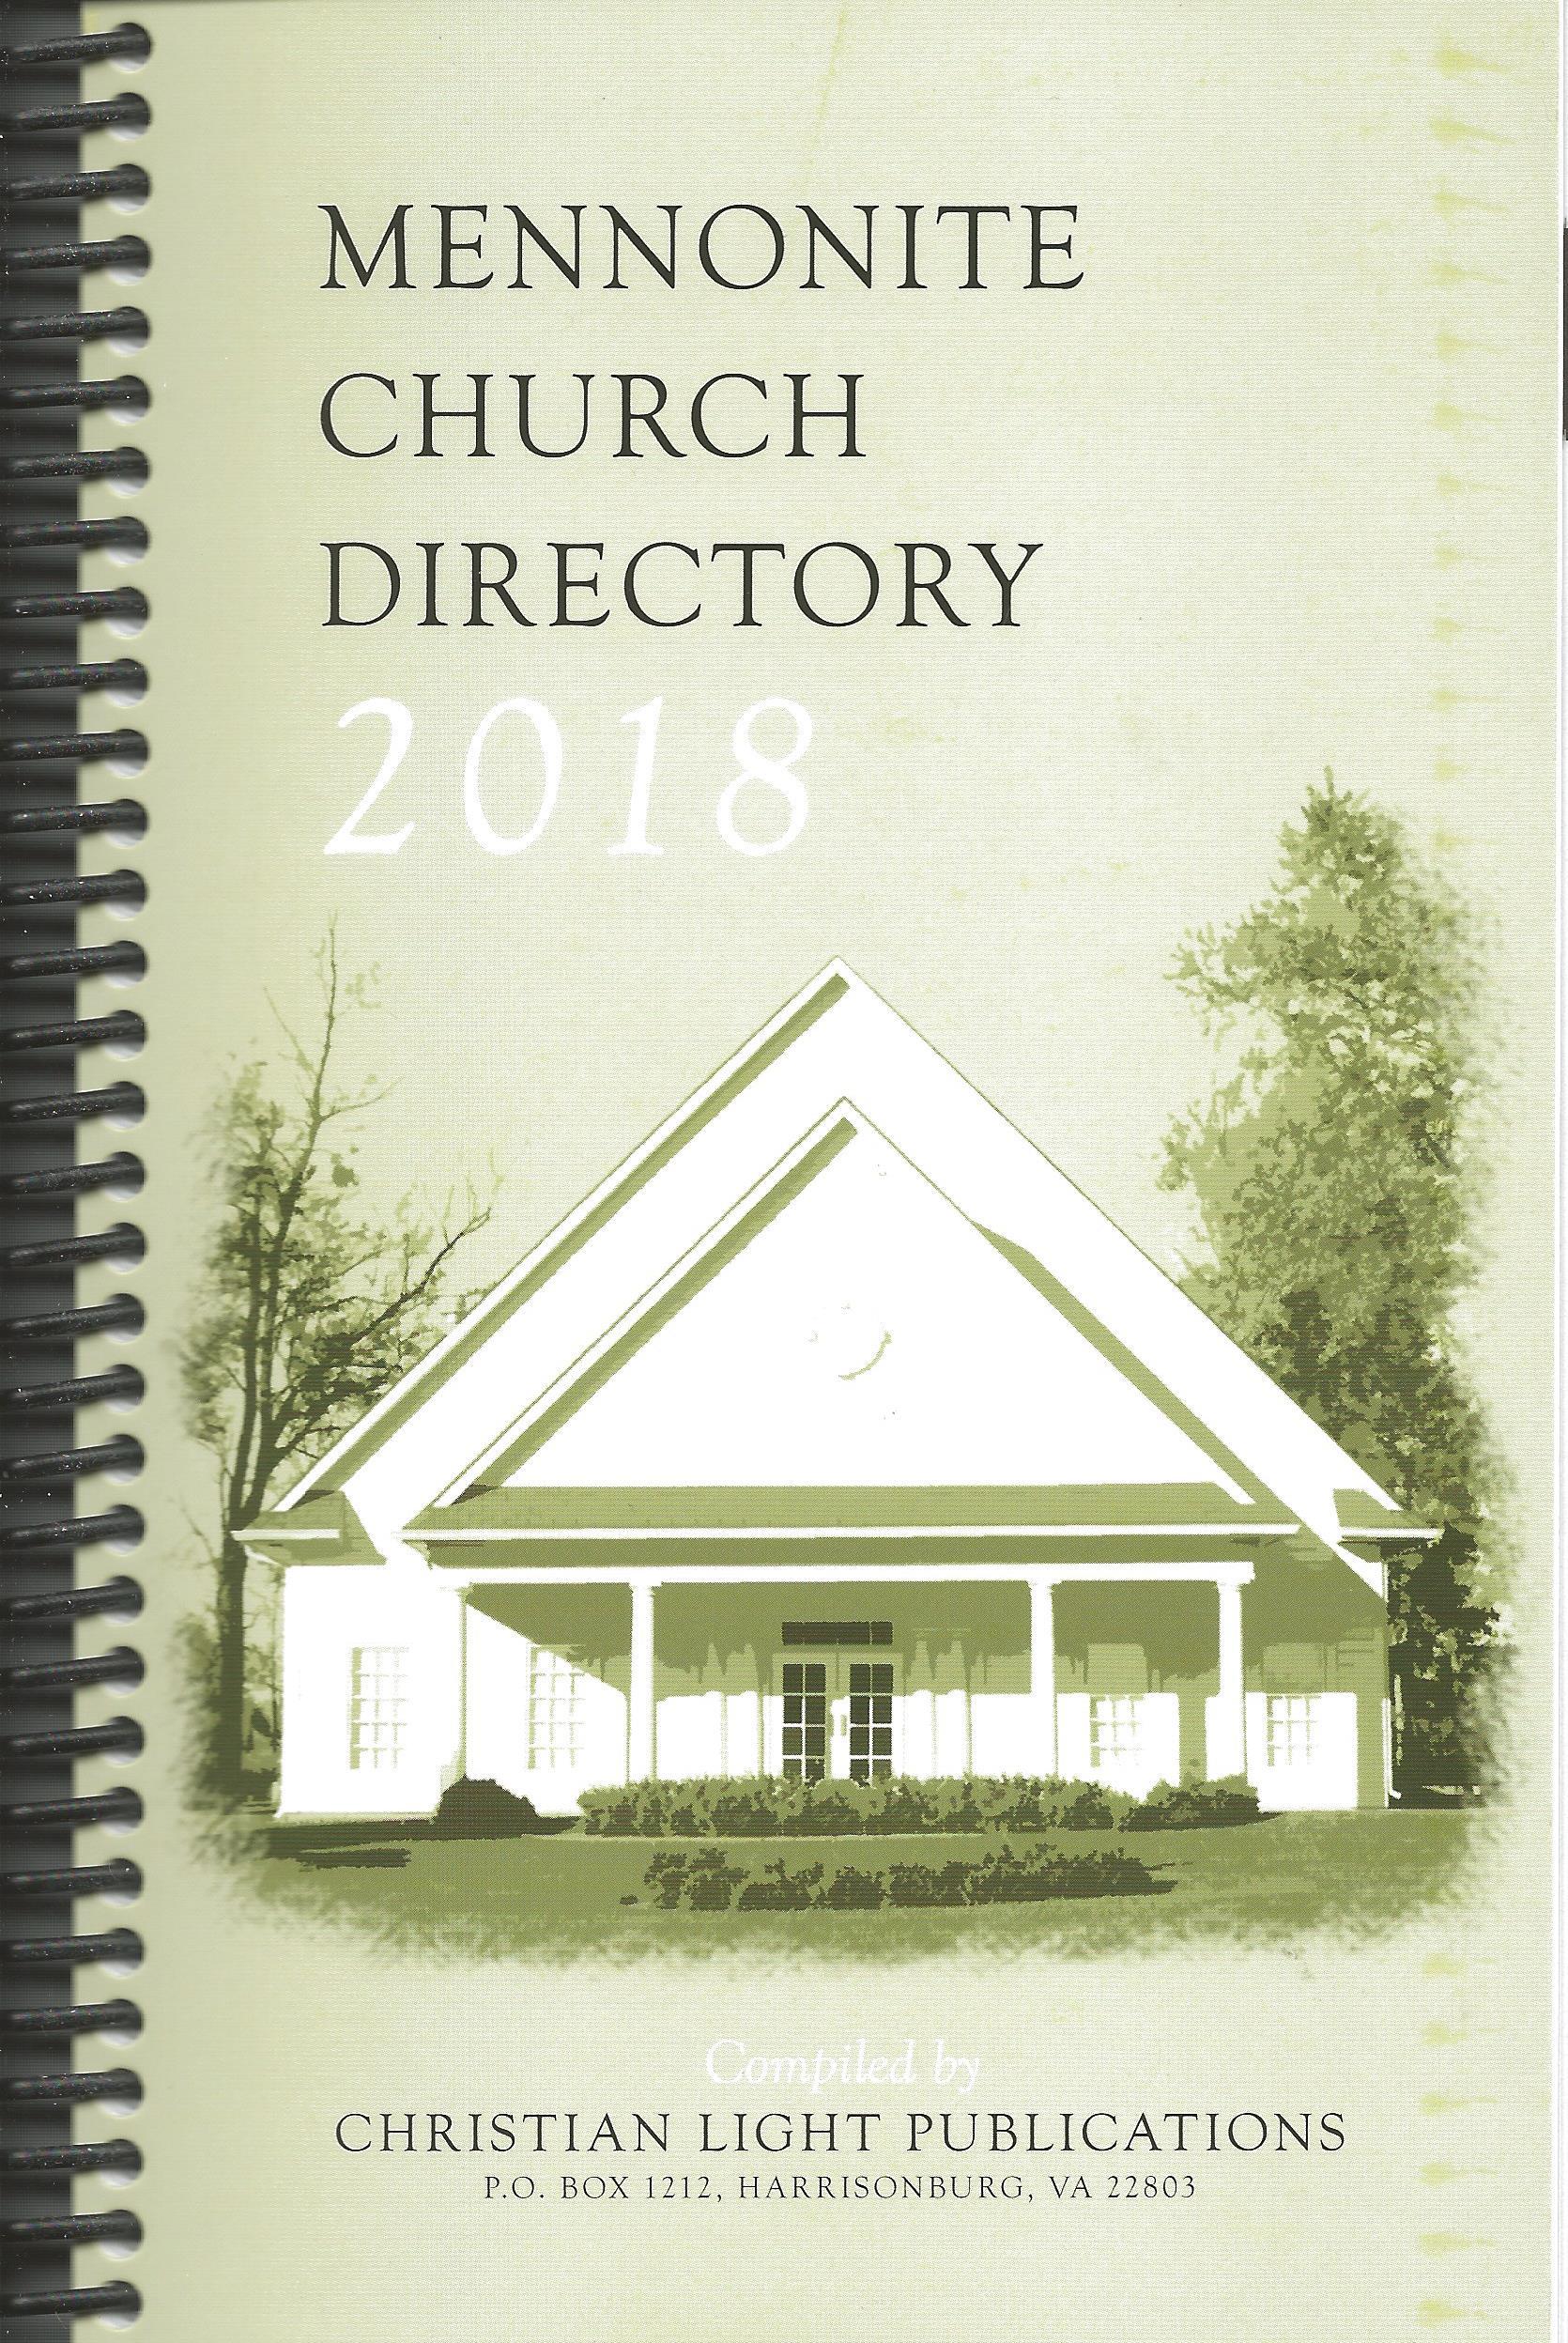 Captivating 2018 MENNONITE CHURCH DIRECTORY CLP Amazing Design